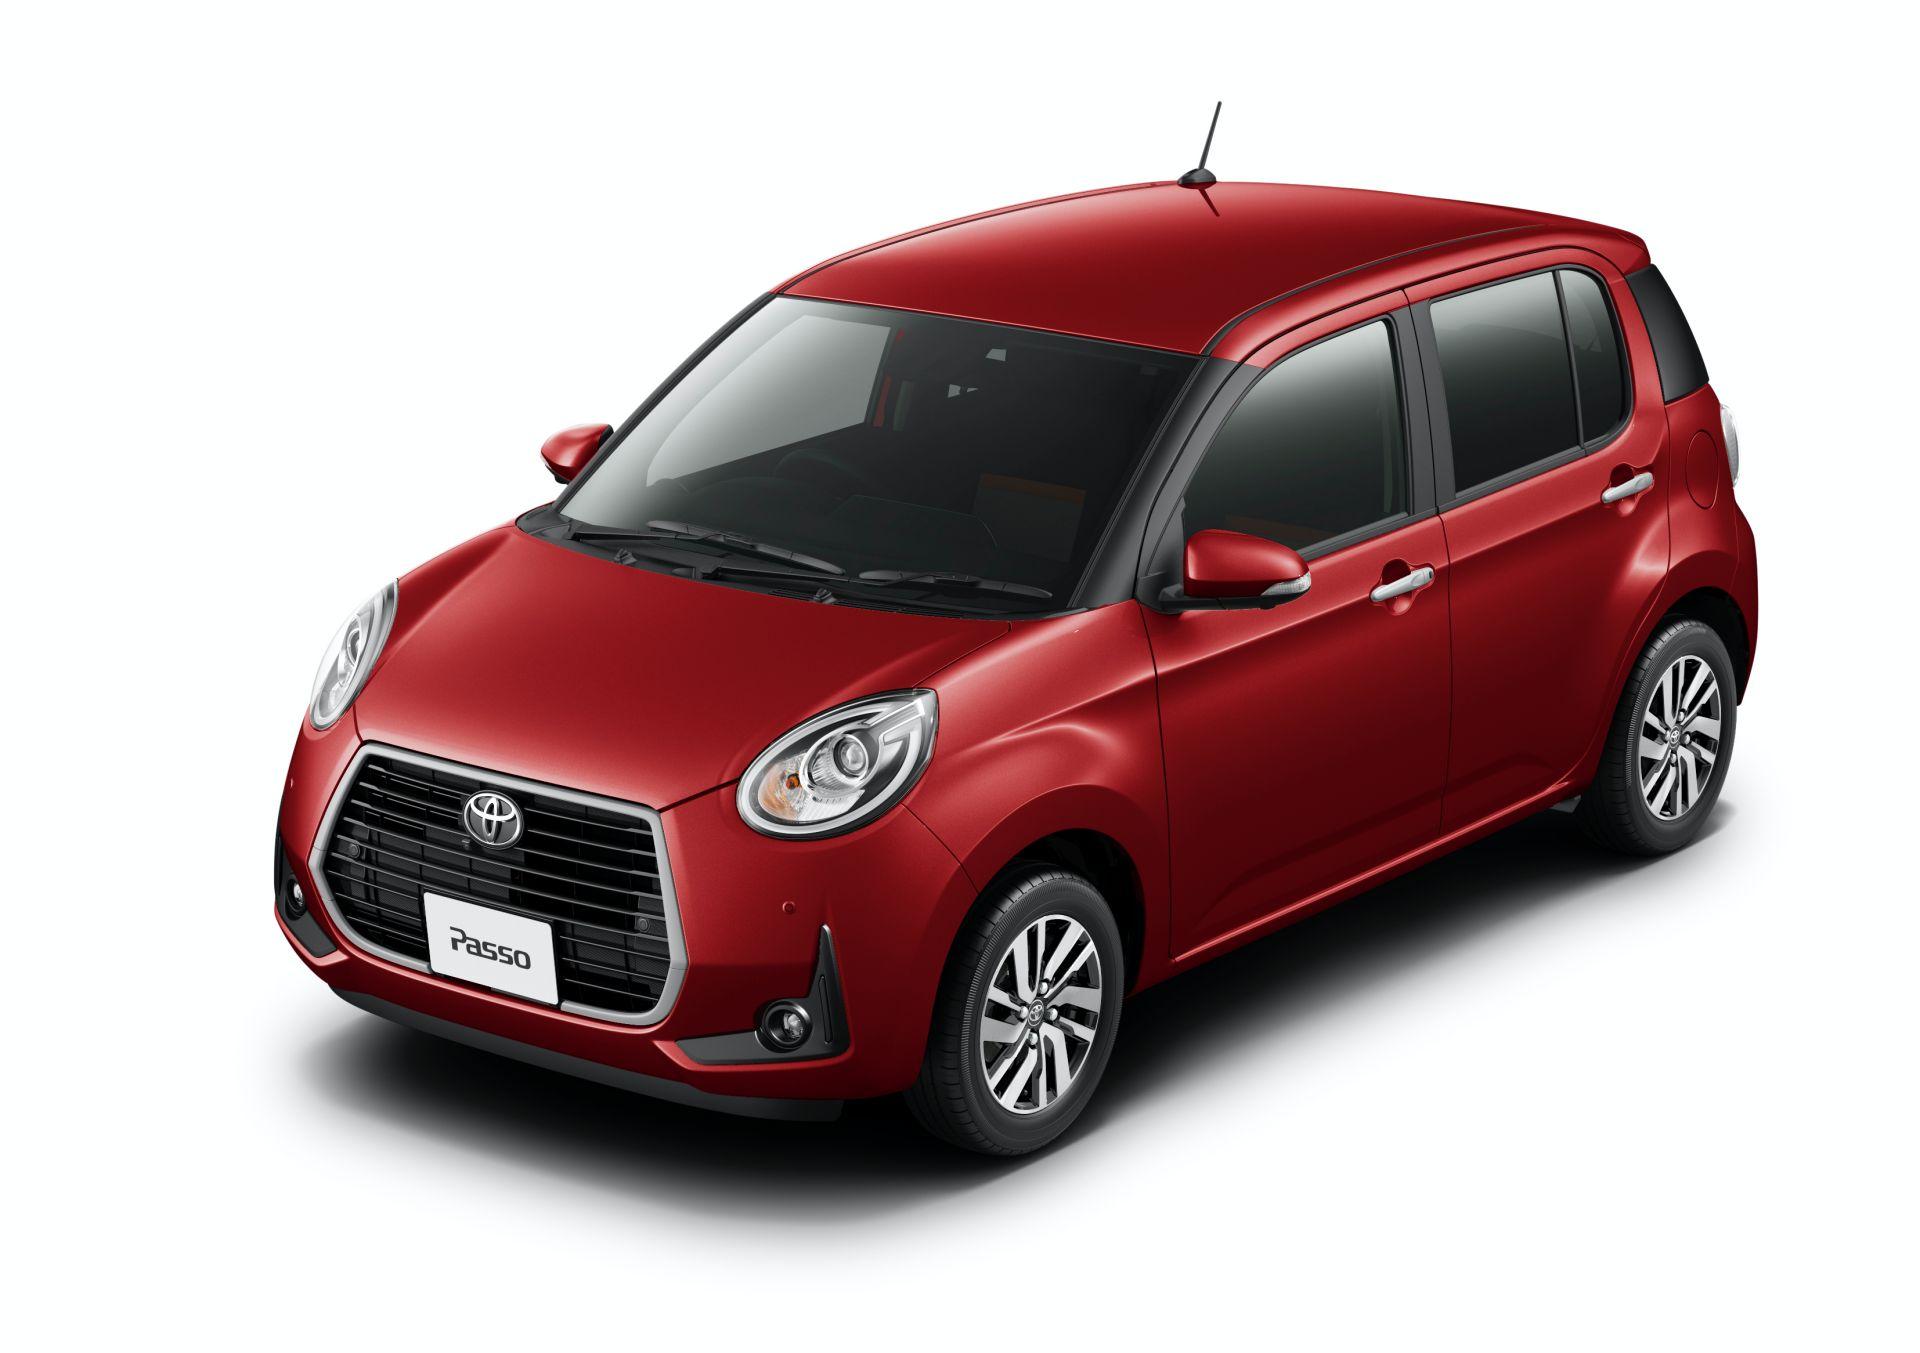 Toyota_Passo_Moda_Charm_0005